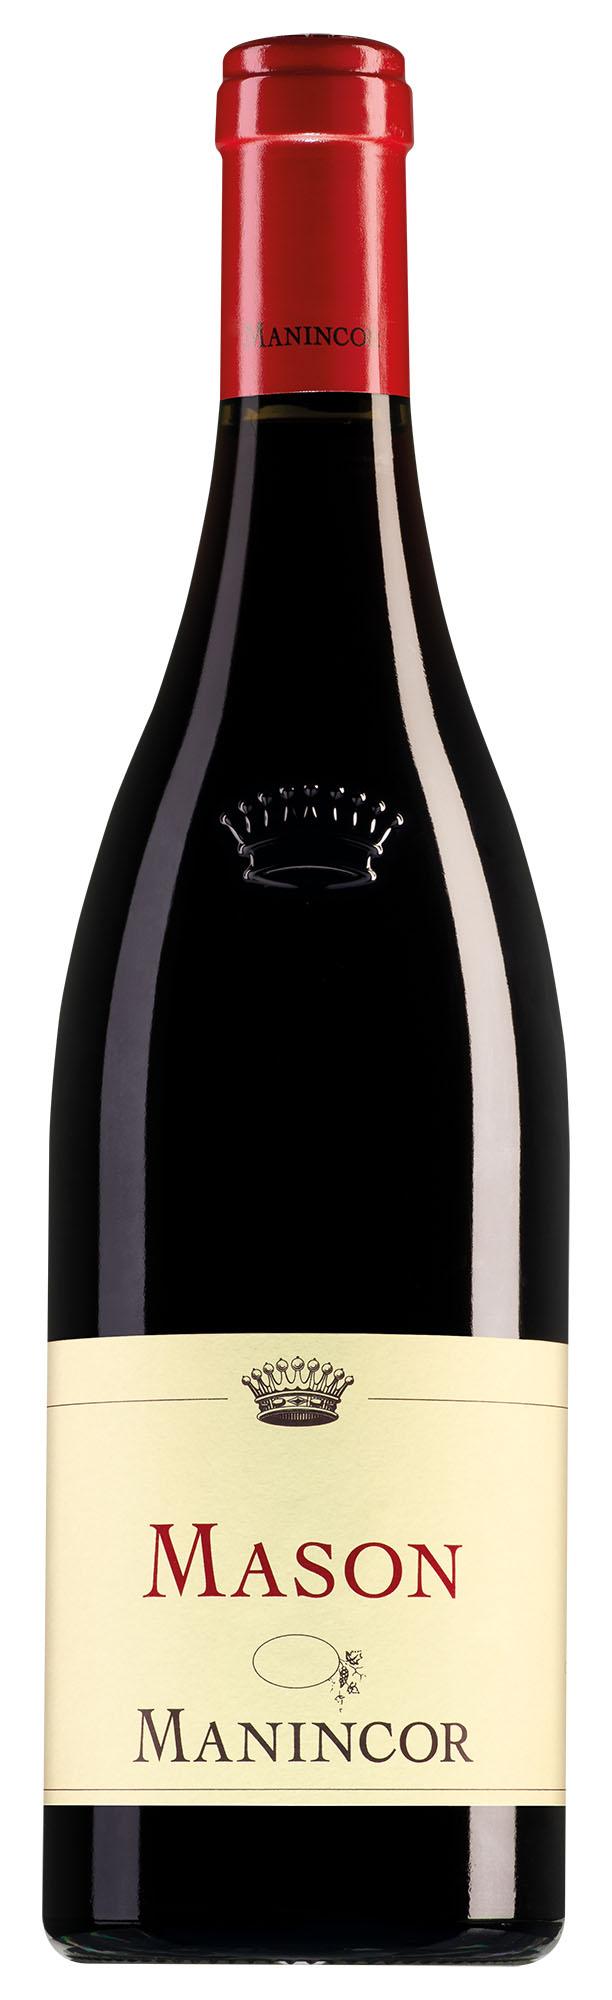 Manincor Alto Adige Mason Pinot Nero